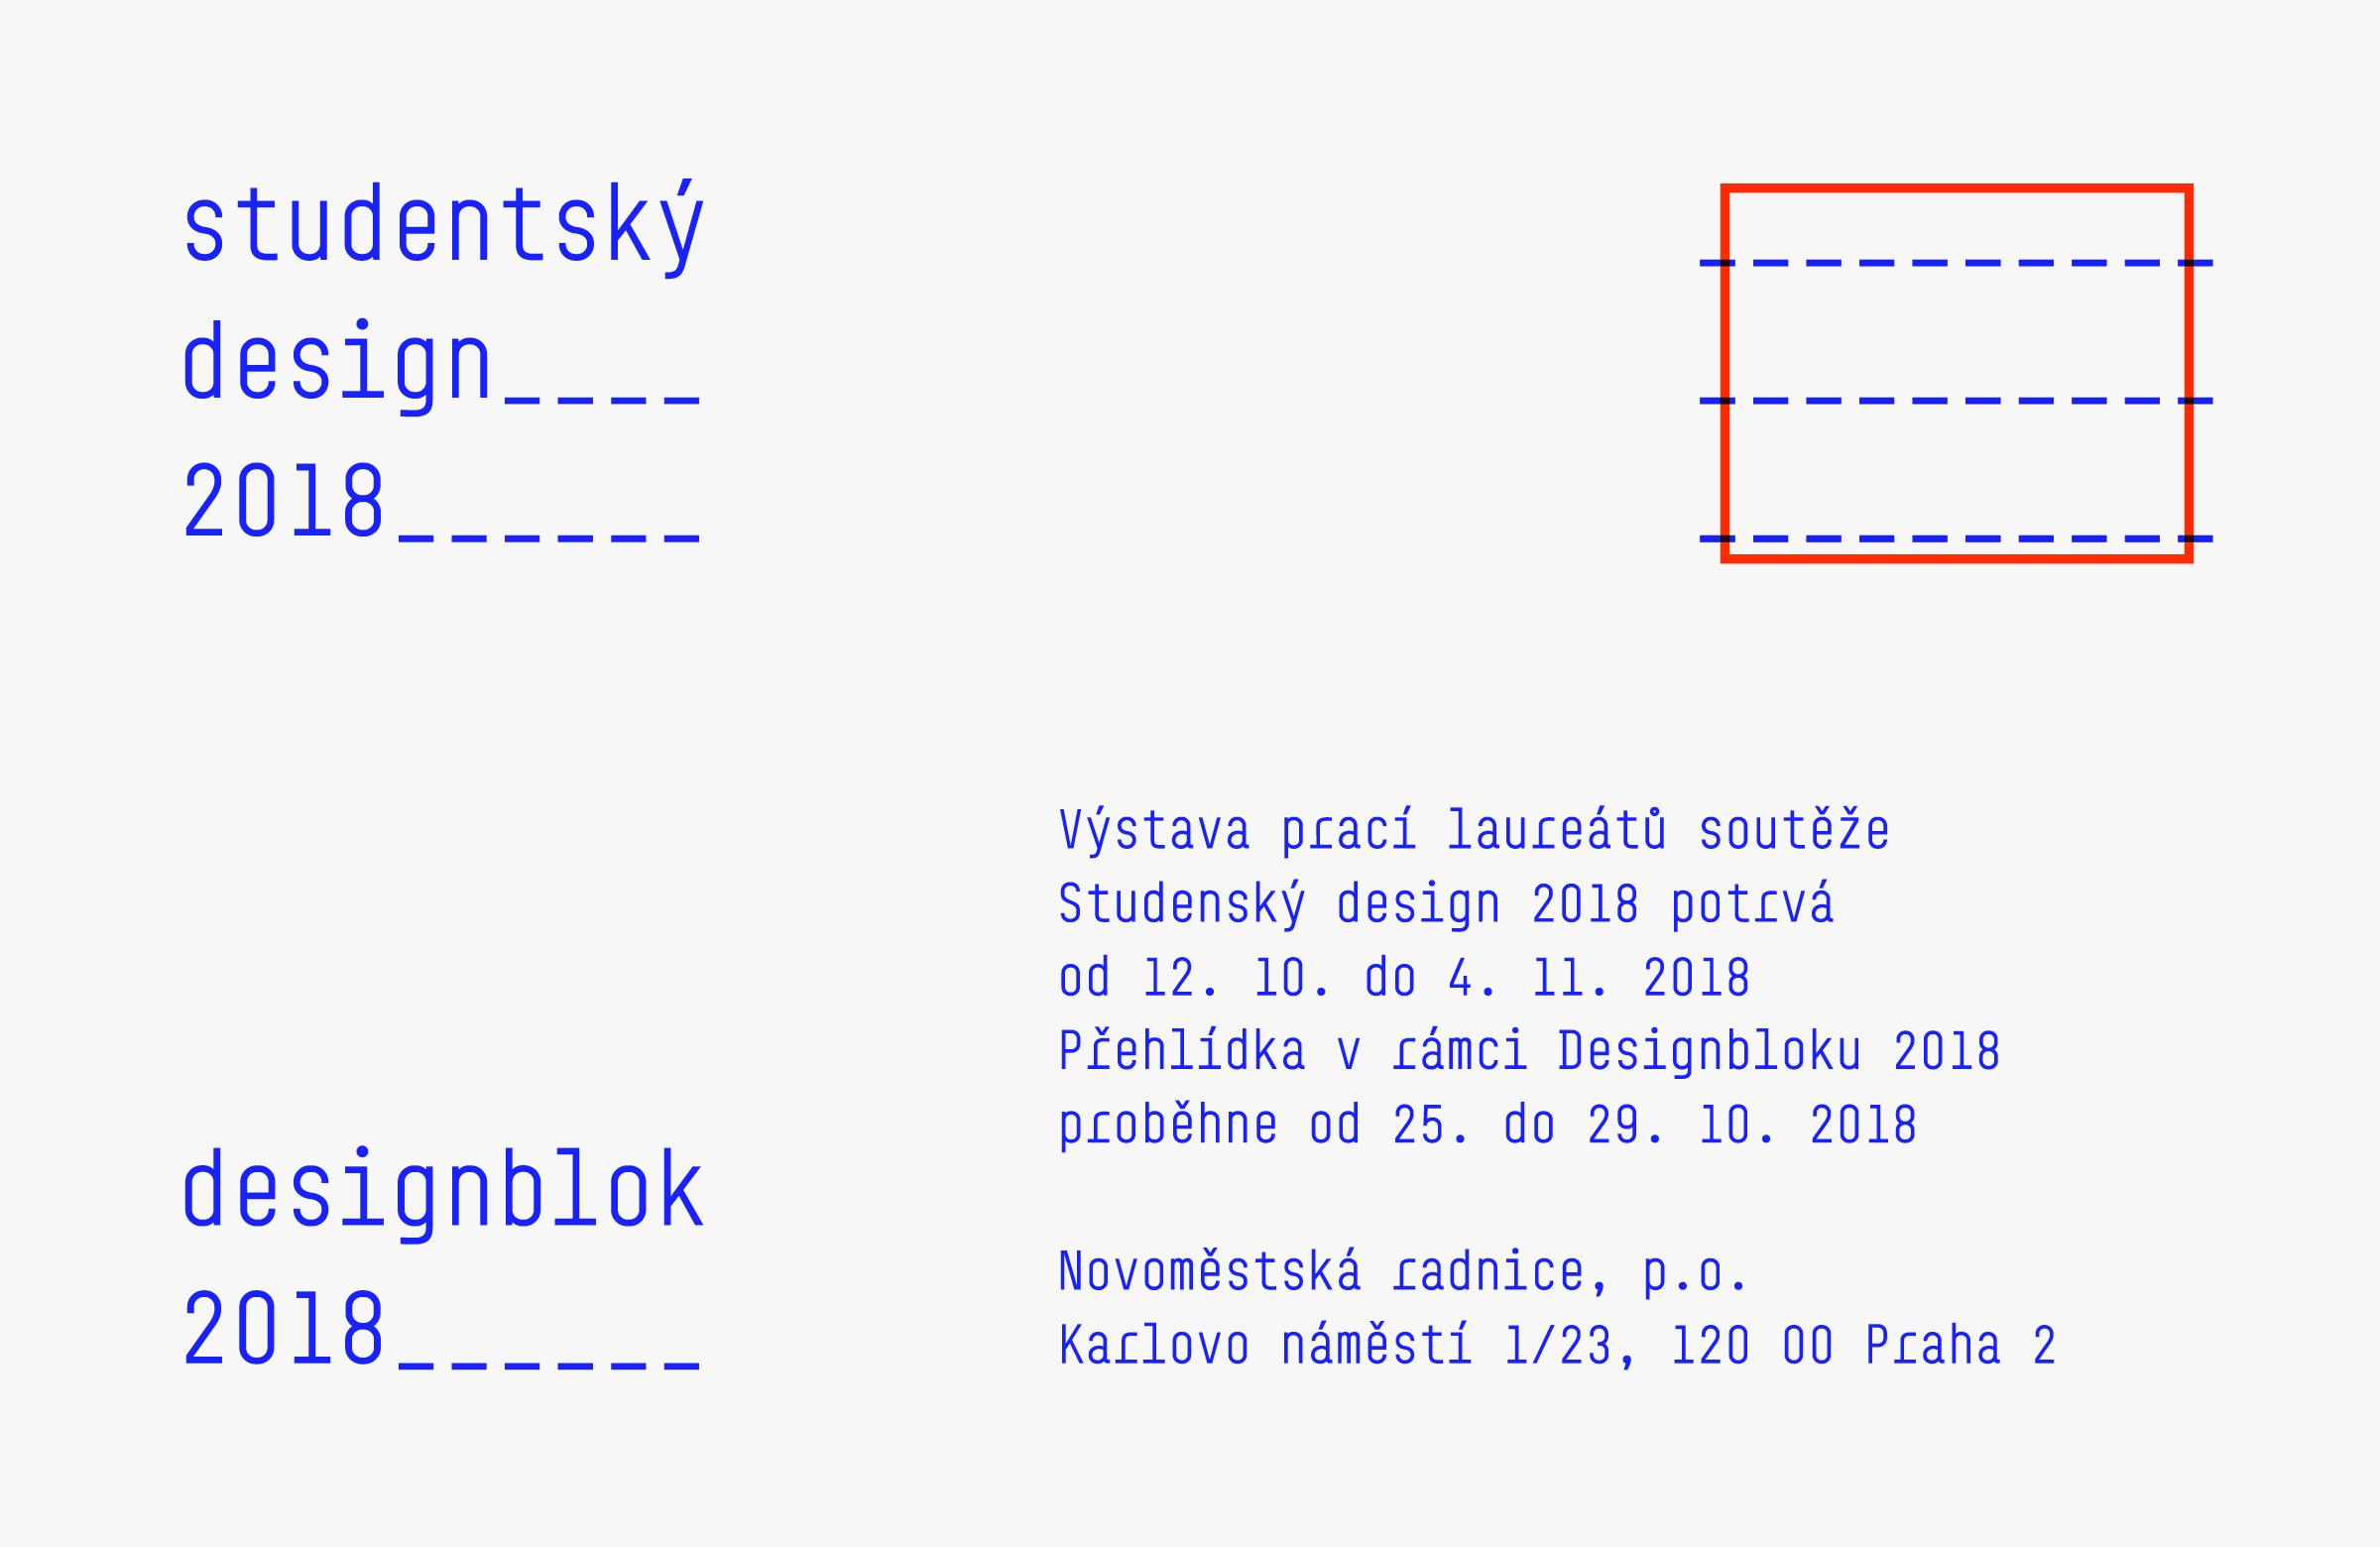 studentsky-design-designblok-2018-banner-info-web